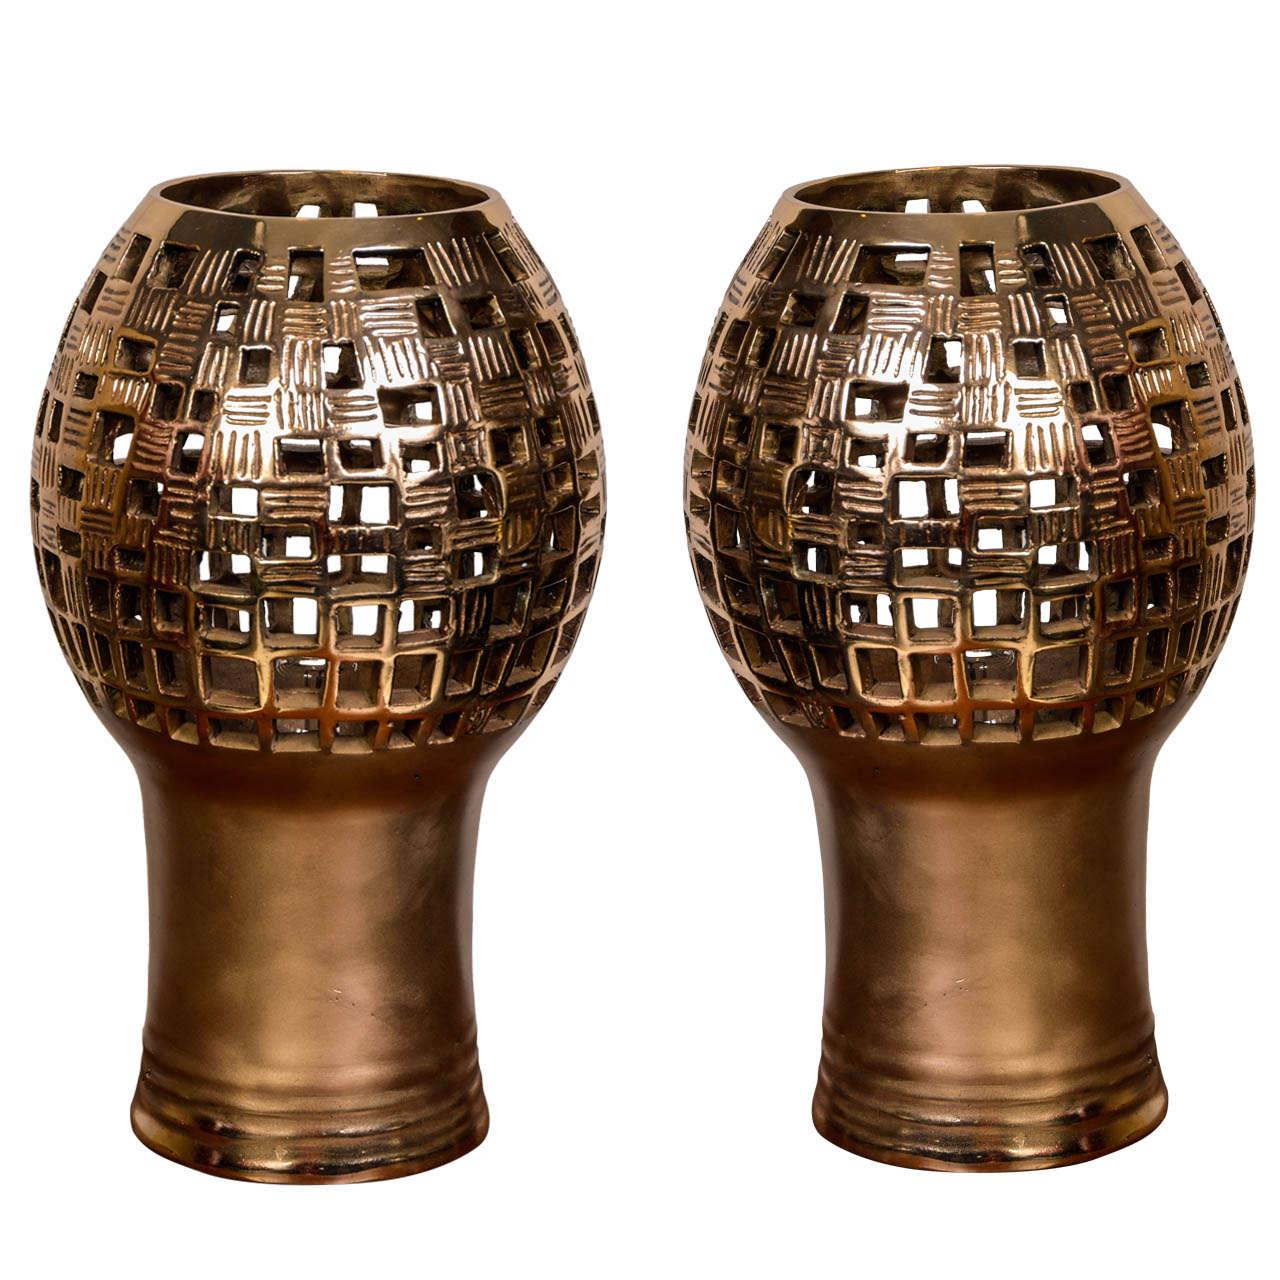 Pair of Bronze Table Lamps by Robert Phandeve